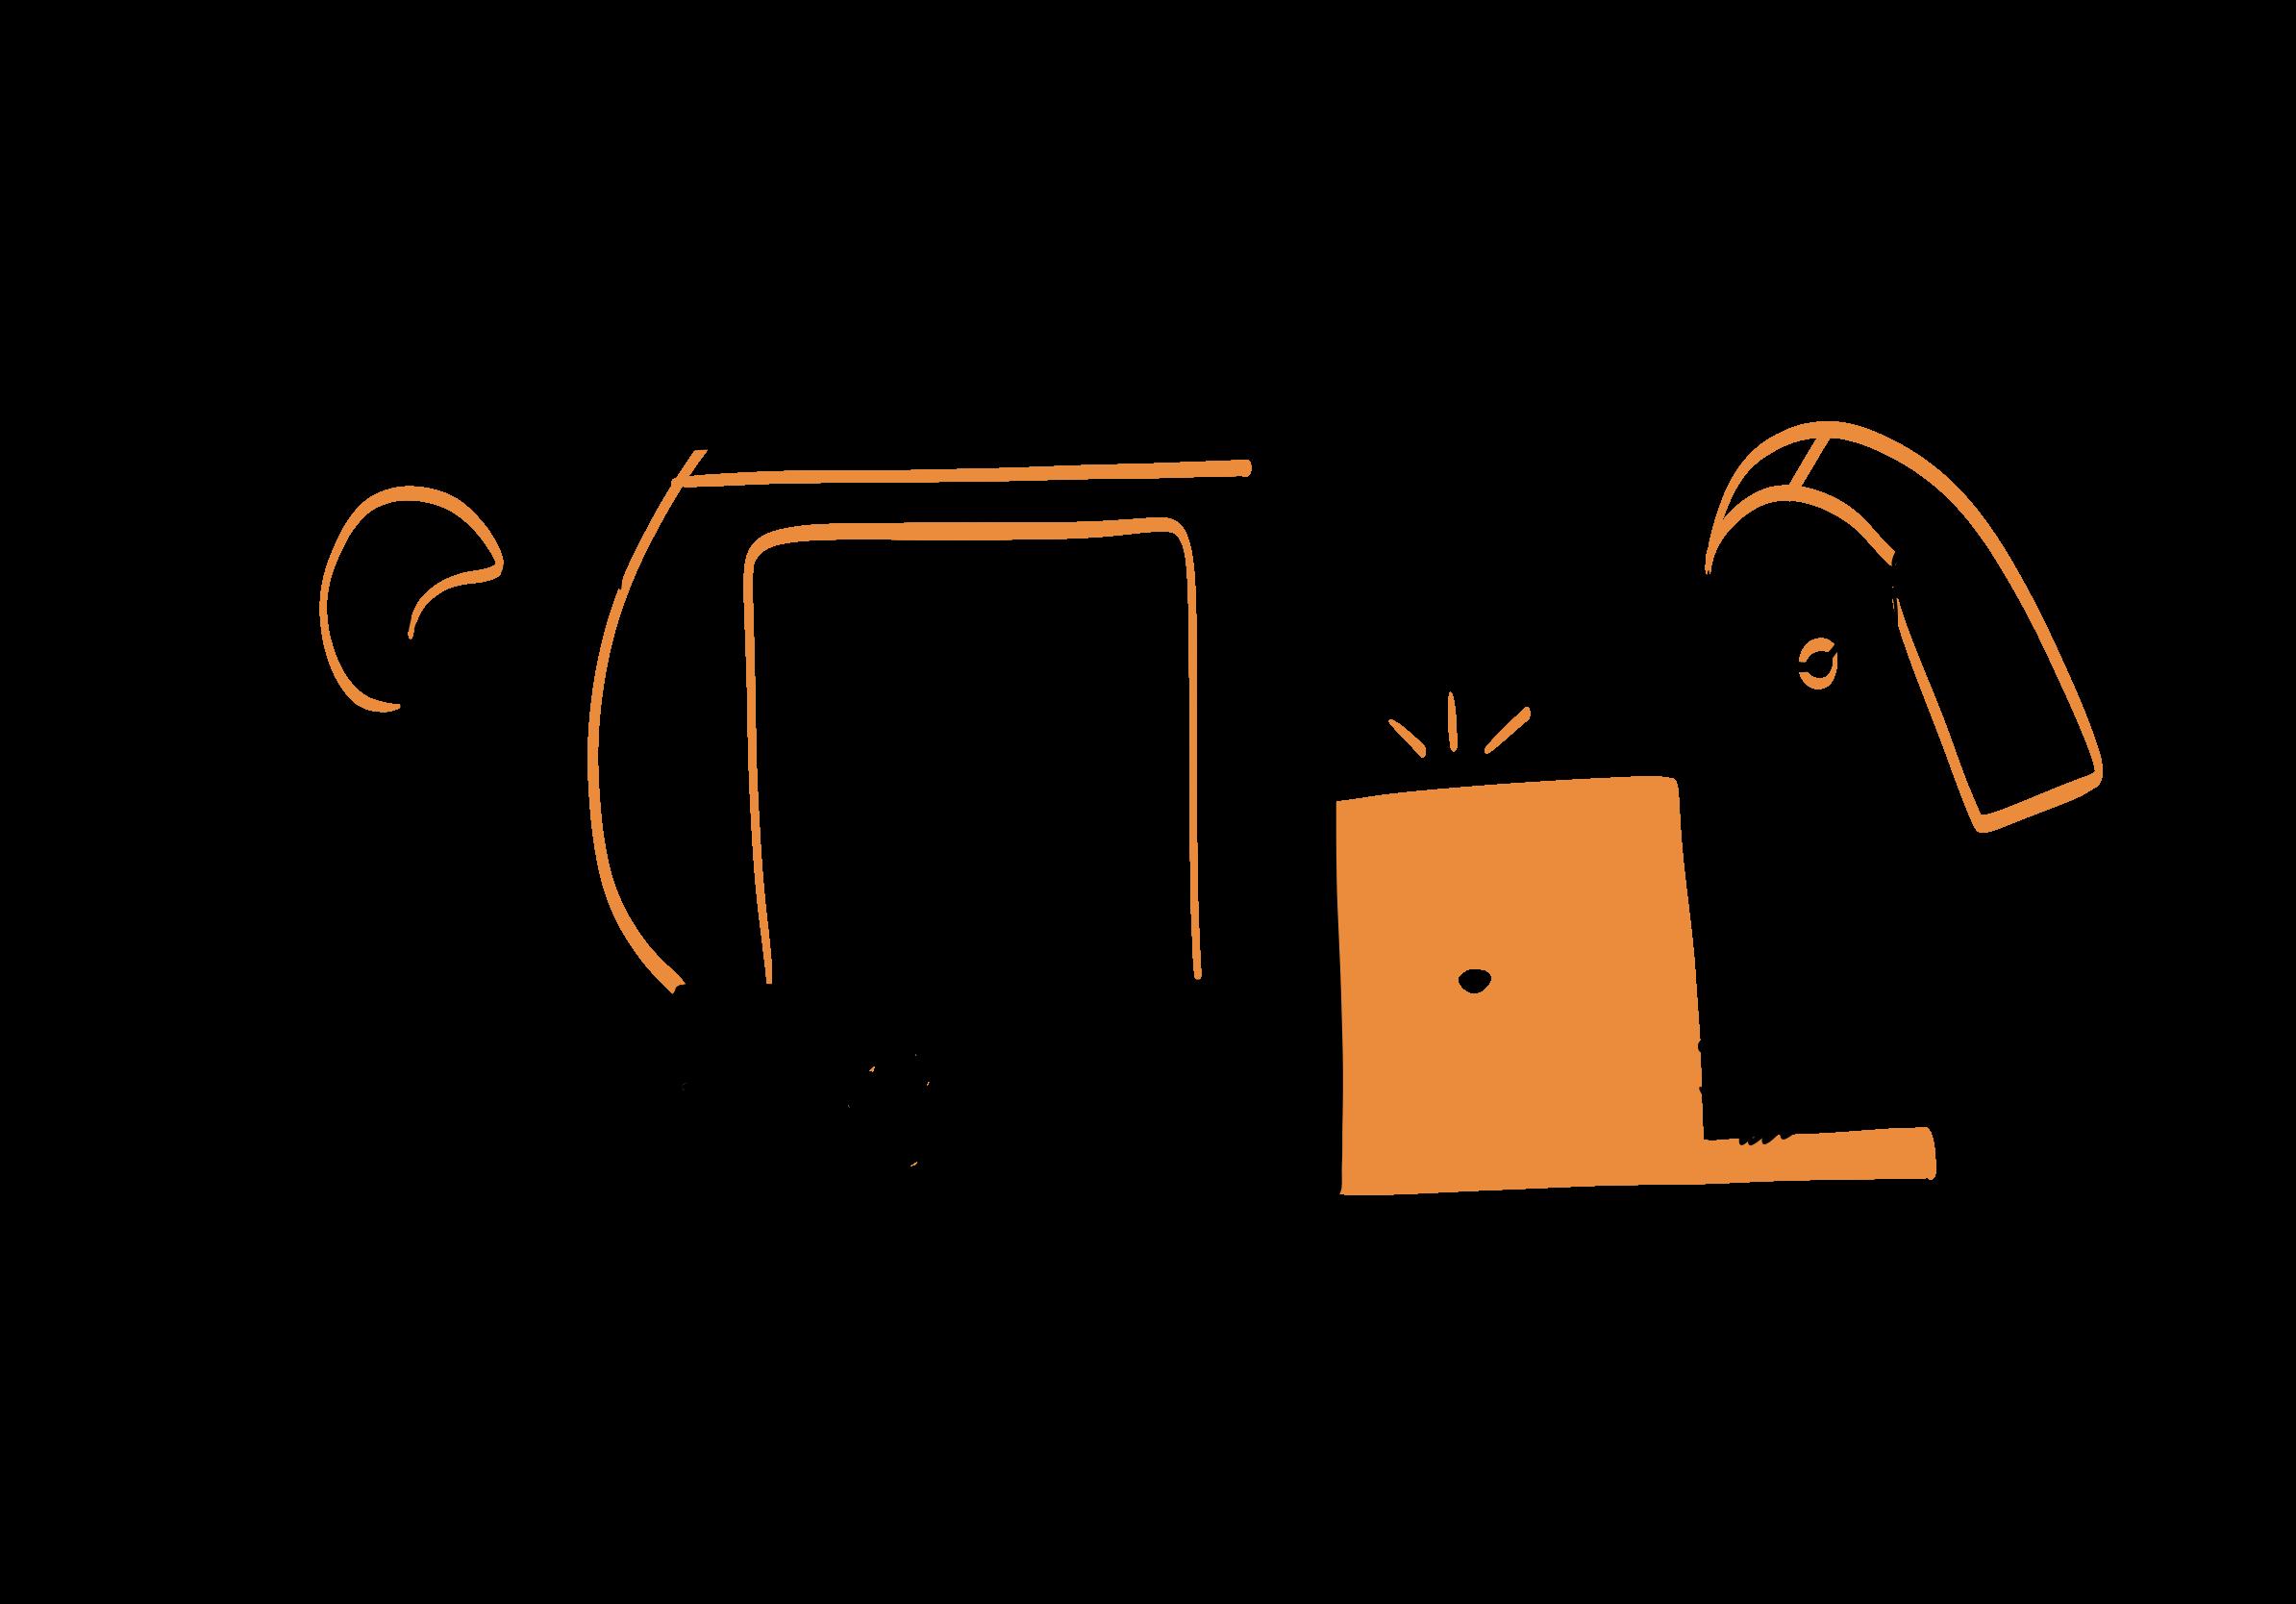 [foundkit]-[web illustration]-[sketches] 5